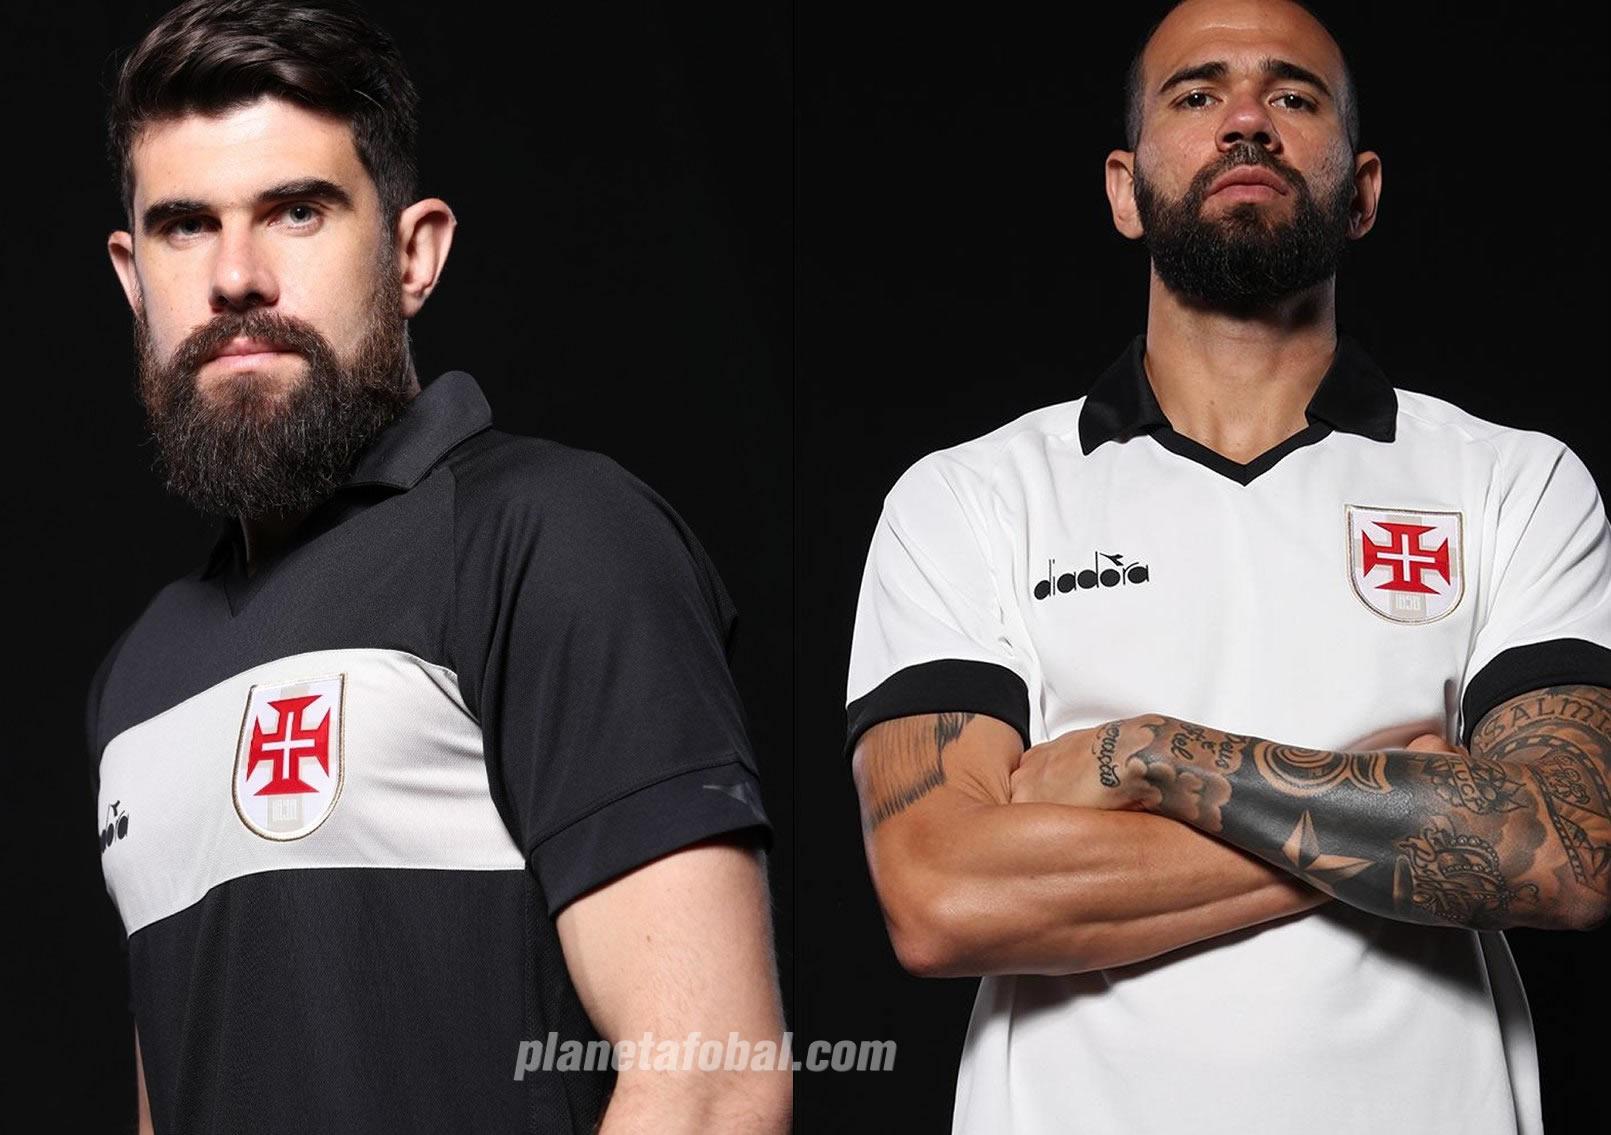 Tercera camiseta Diadora del Vasco Da Gama 2019/20 | Imagen Twitter Oficial